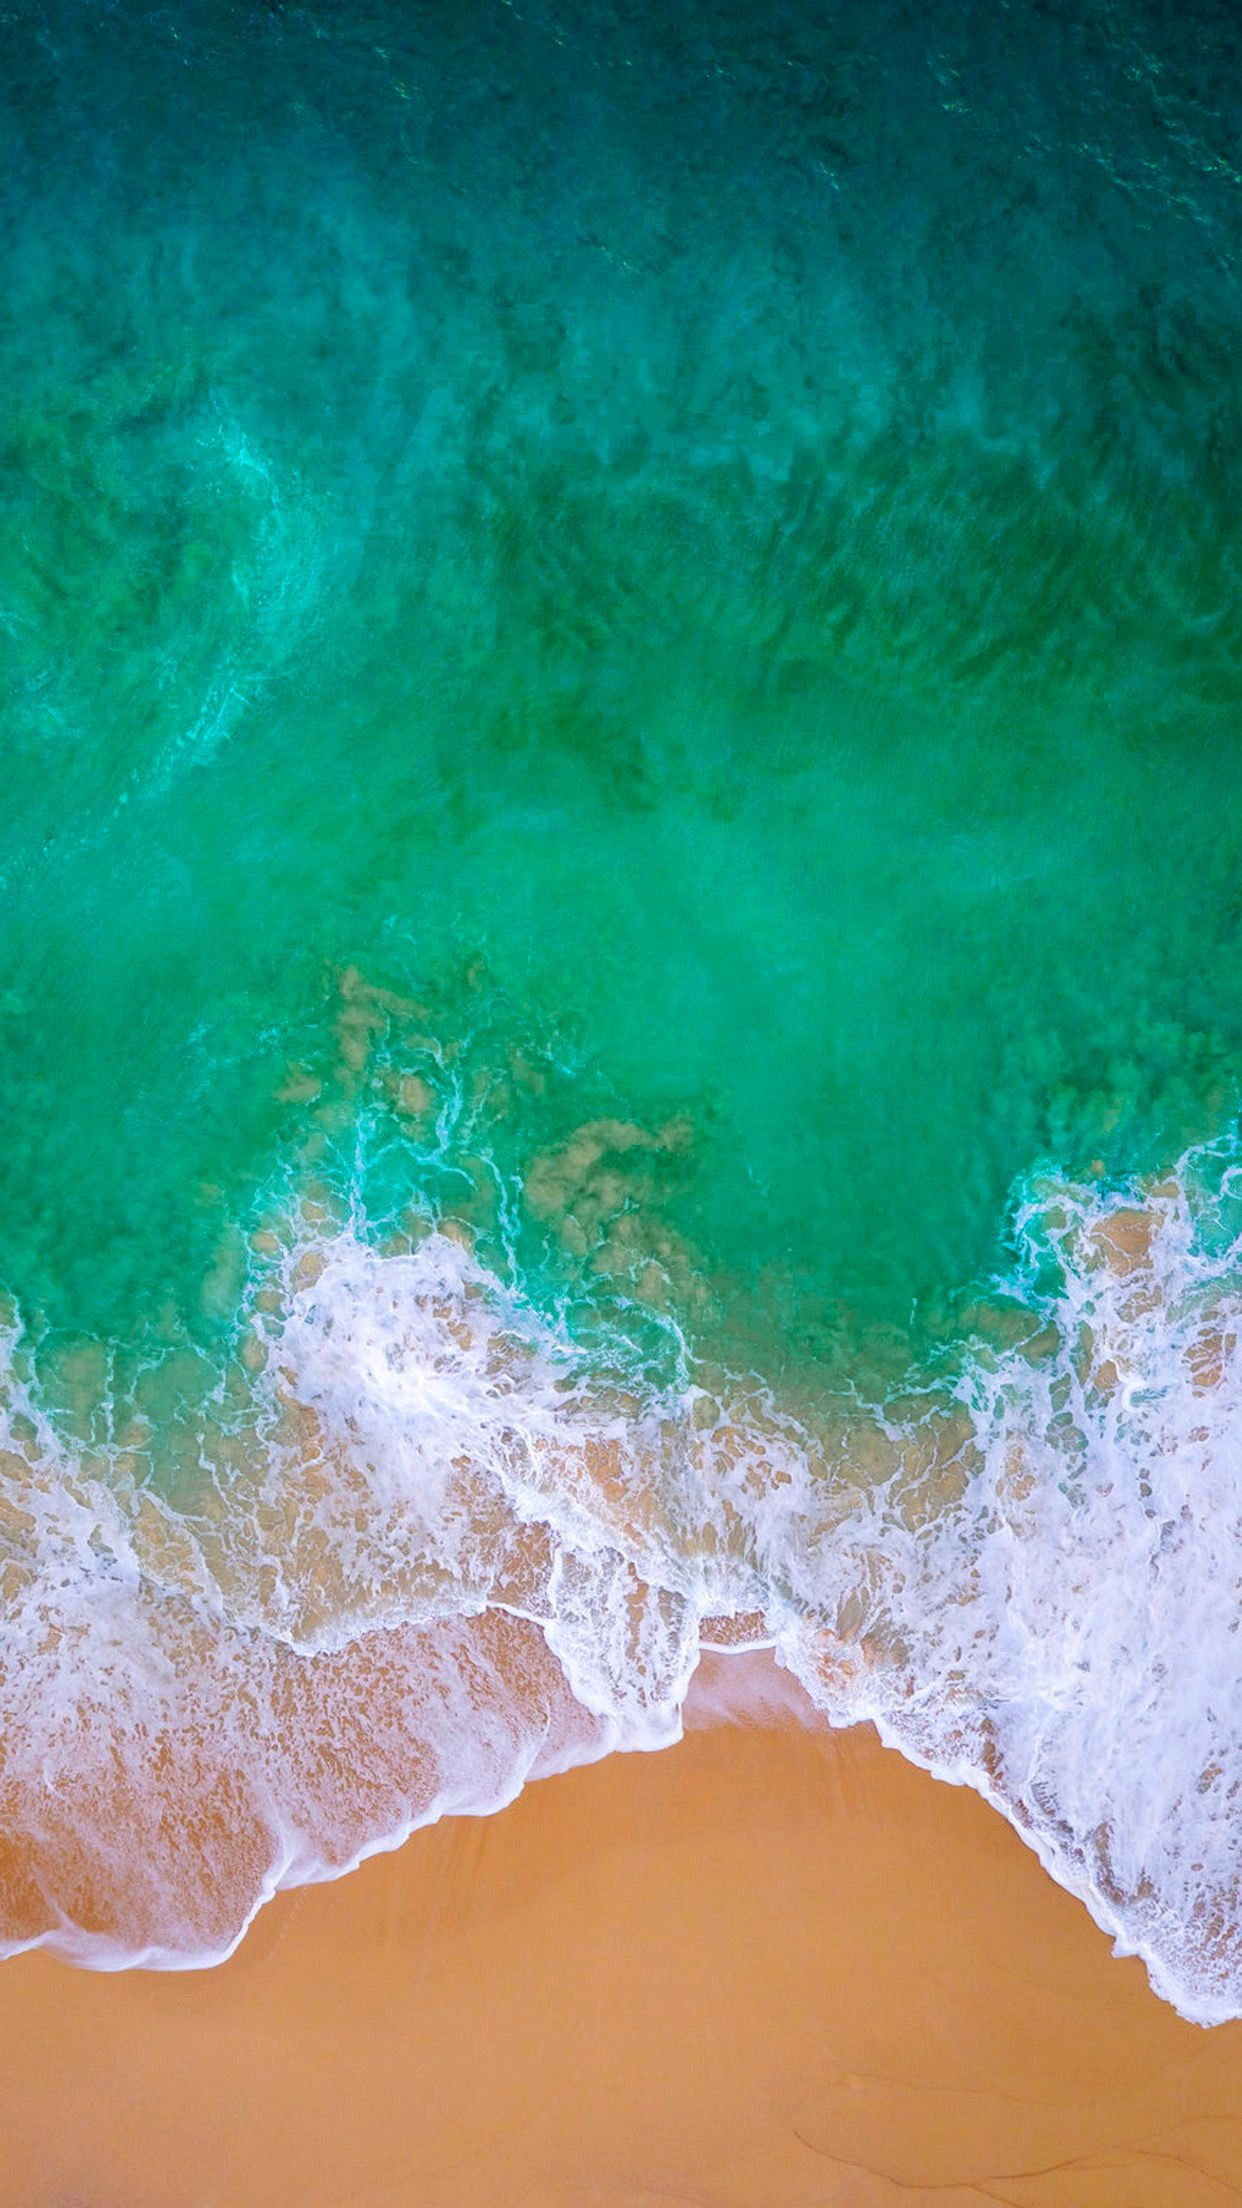 Iphone Wallpaper Pinterest خلفيات بينترست ايفون 2019 Tecnologis Ios 11 Wallpaper Iphone Wallpaper Ocean Beach Wallpaper Iphone